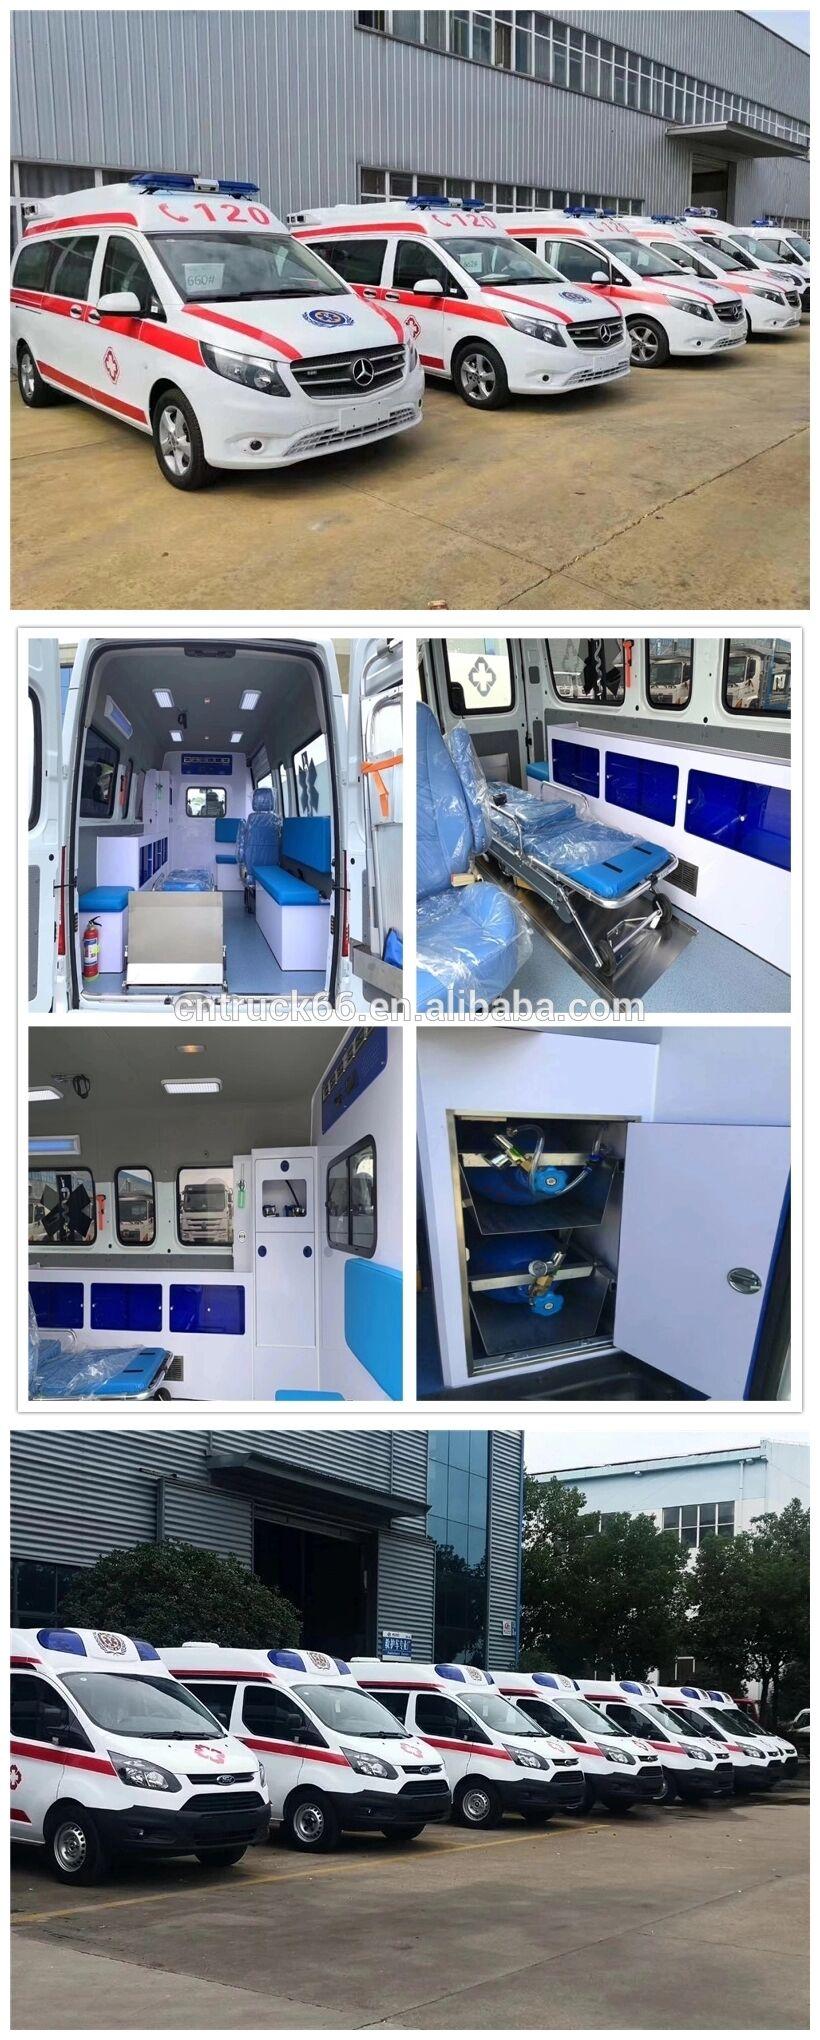 Ambulance car details